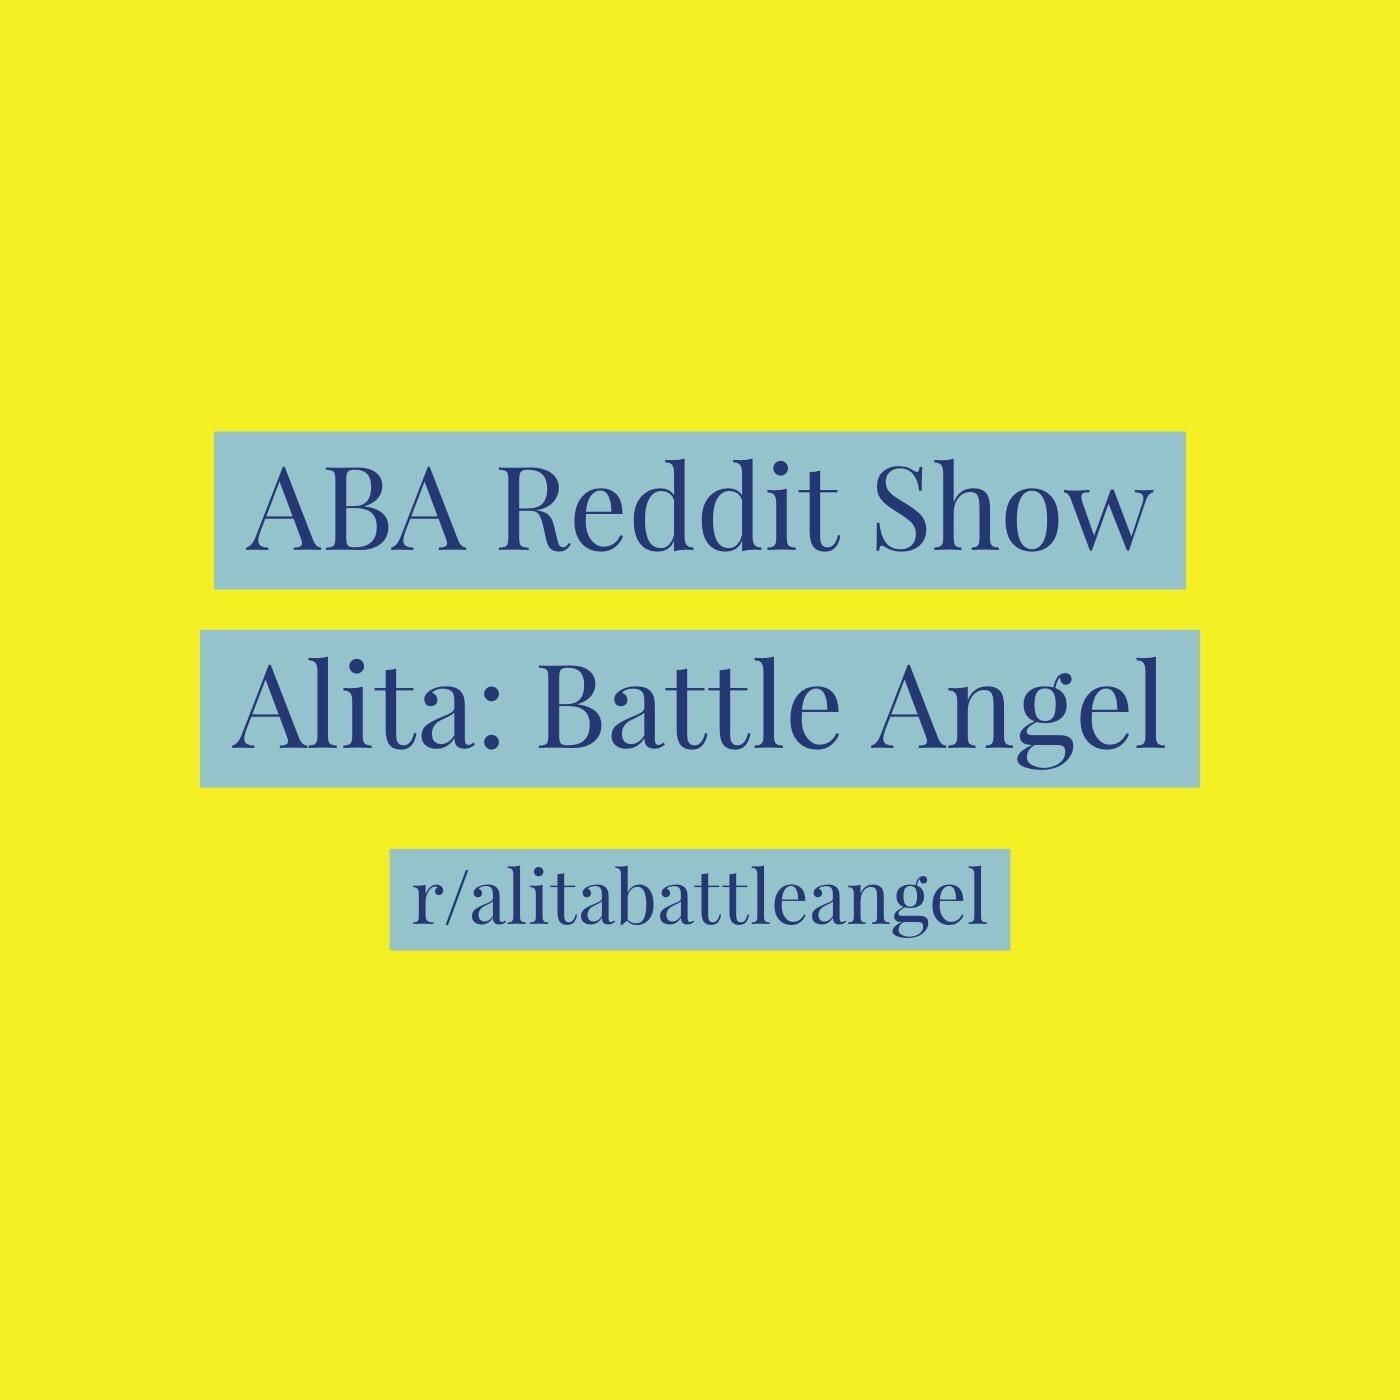 Alita Battle Angel Reddit Show